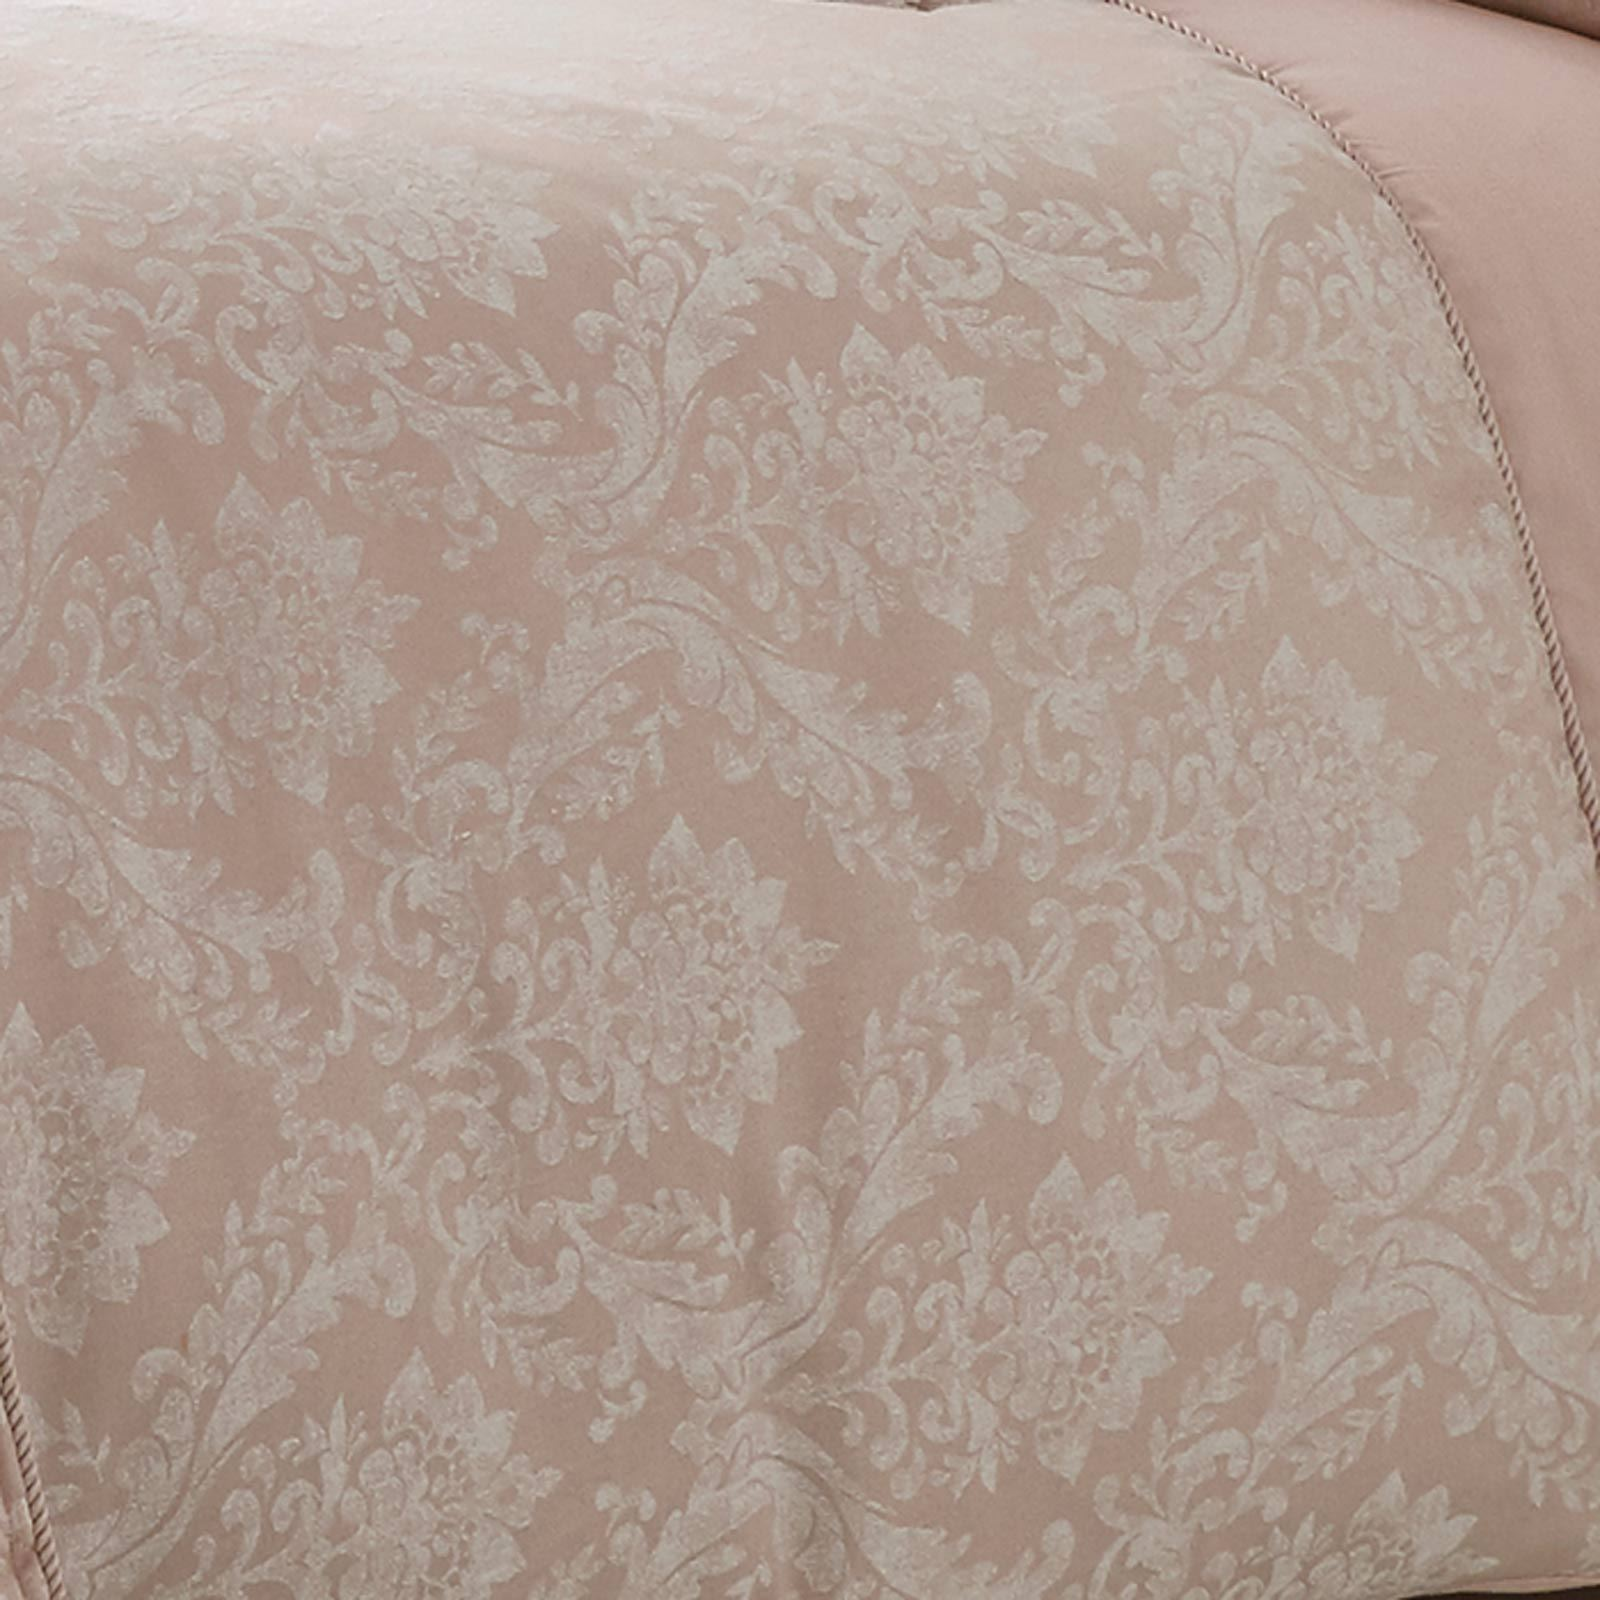 Cubierta-Edredon-Rosa-Blush-Rose-Impreso-juego-De-Edredon-Conjuntos-de-Cama-cubre-Jacquard miniatura 18